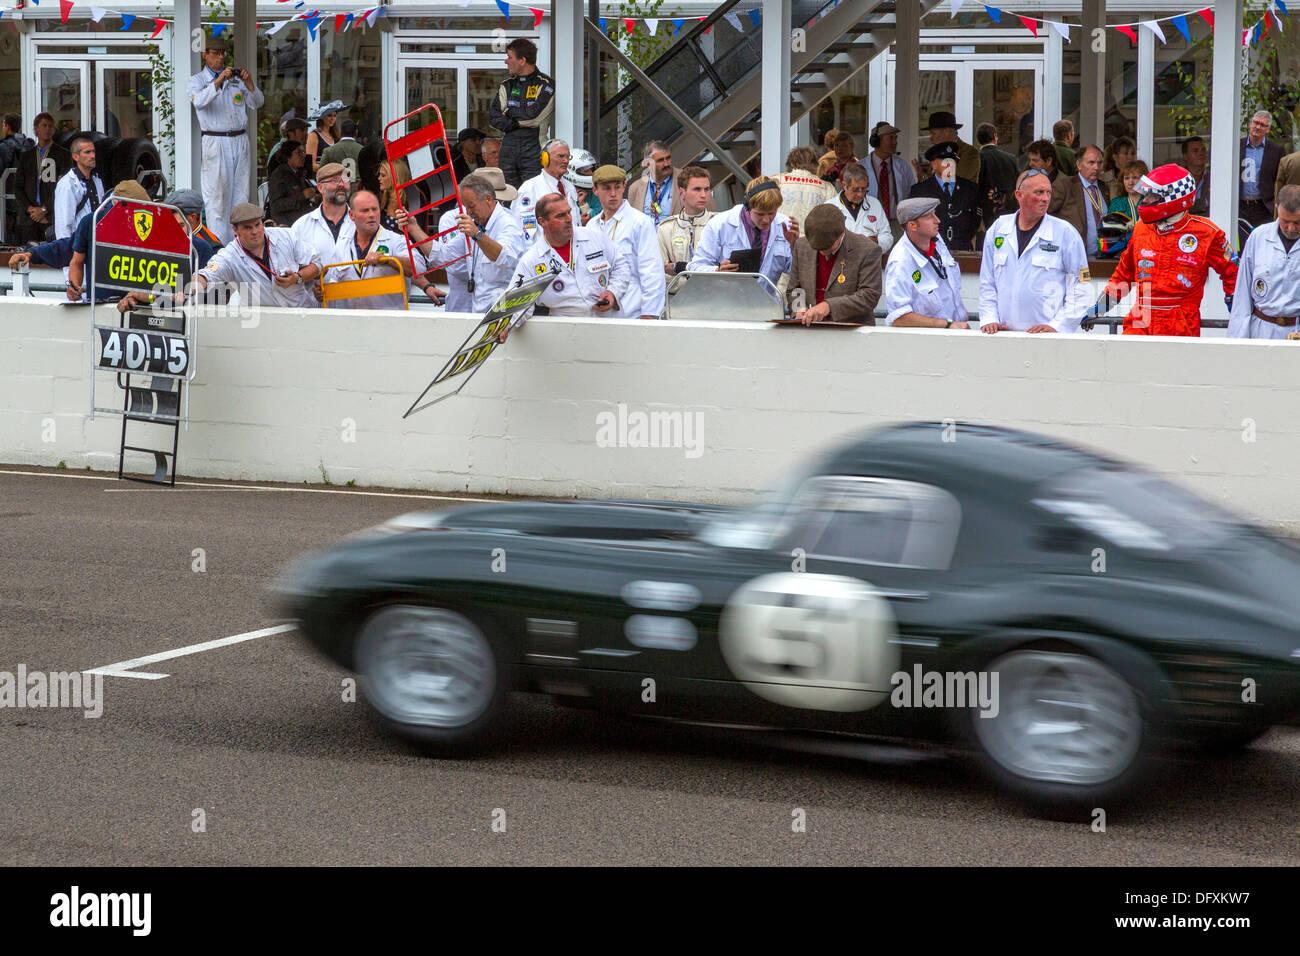 1963 Jaguar E-Type lightweight 'Lowdrag' passes the pits during the 2013 Goodwood Revival, Sussex, UK. RAC TT Celebration race. - Stock Image